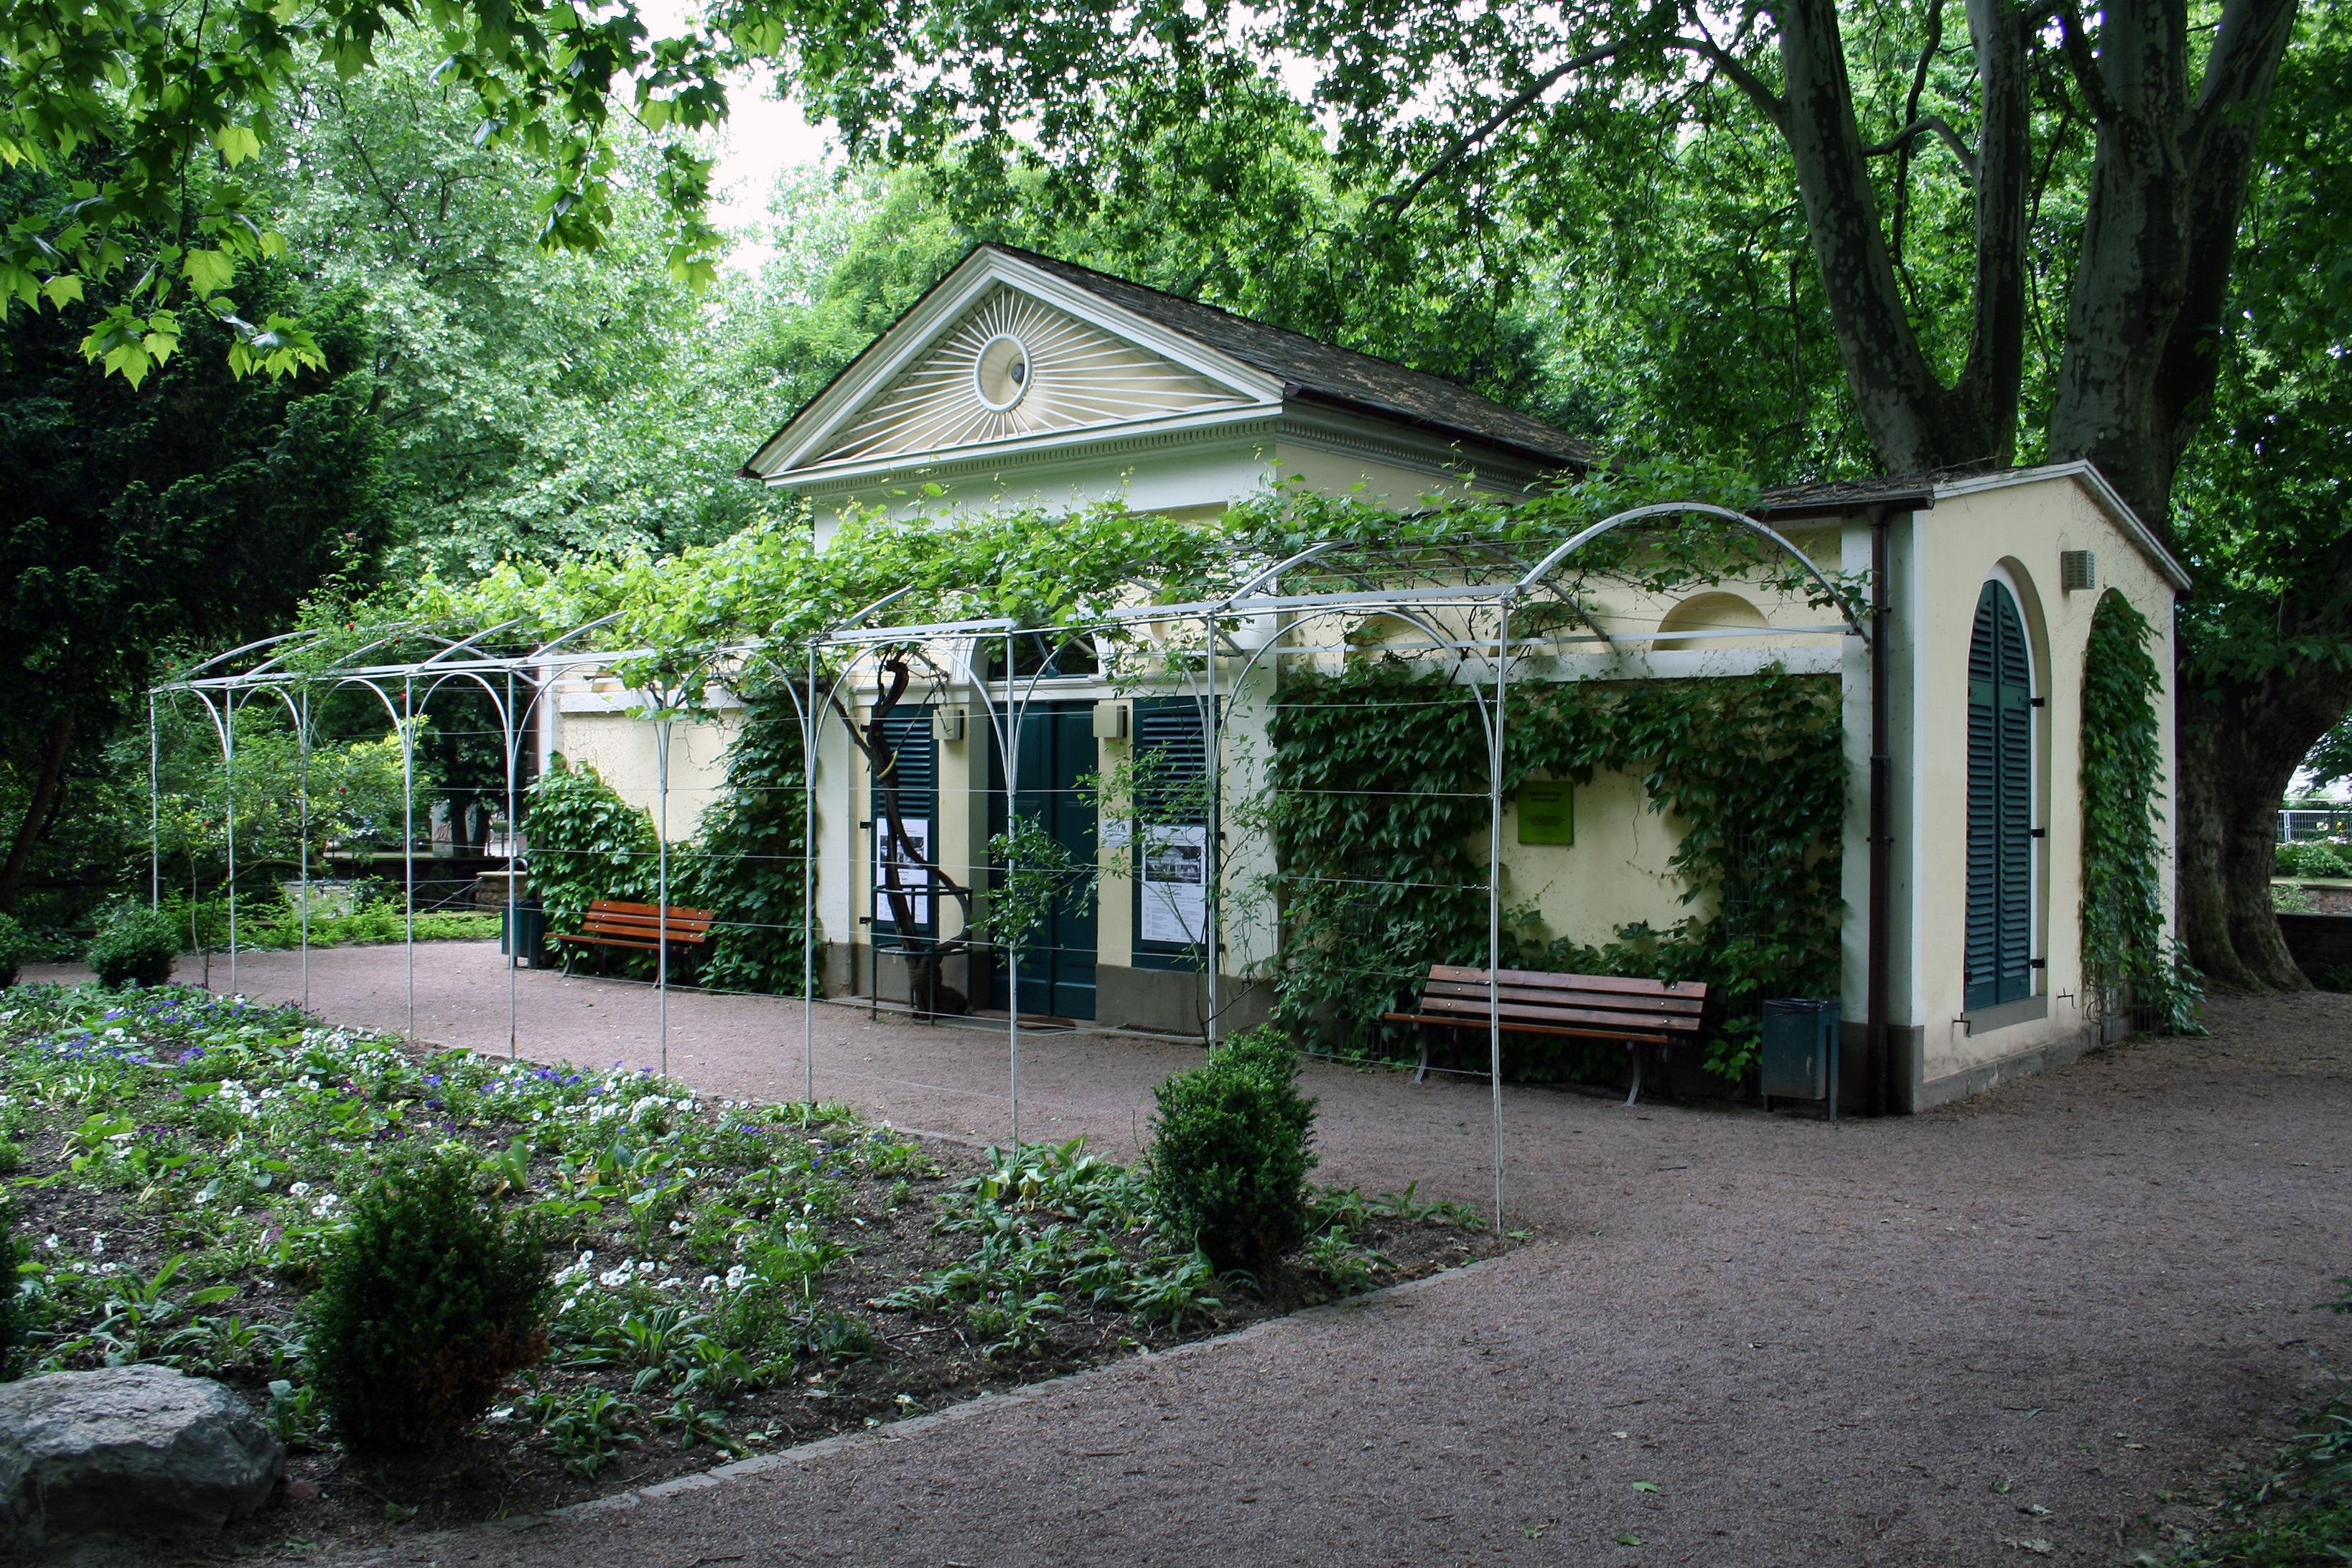 Nebbiensches gartenhaus - Gartenhaus frankfurt ...